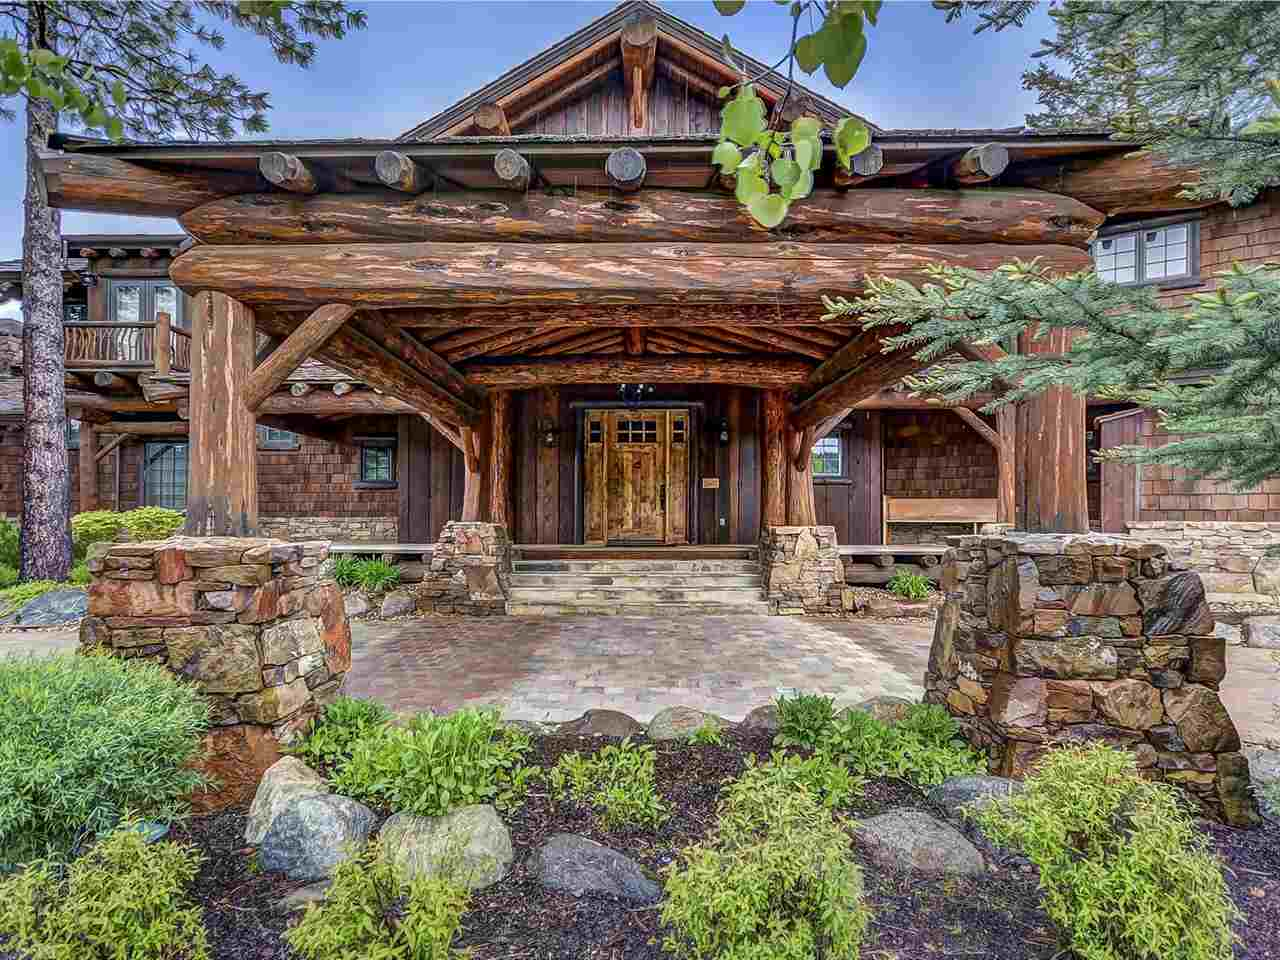 Casa Unifamiliar por un Venta en 5619 Appaloosa Trail 5619 Appaloosa Trail McCall, Idaho 83638